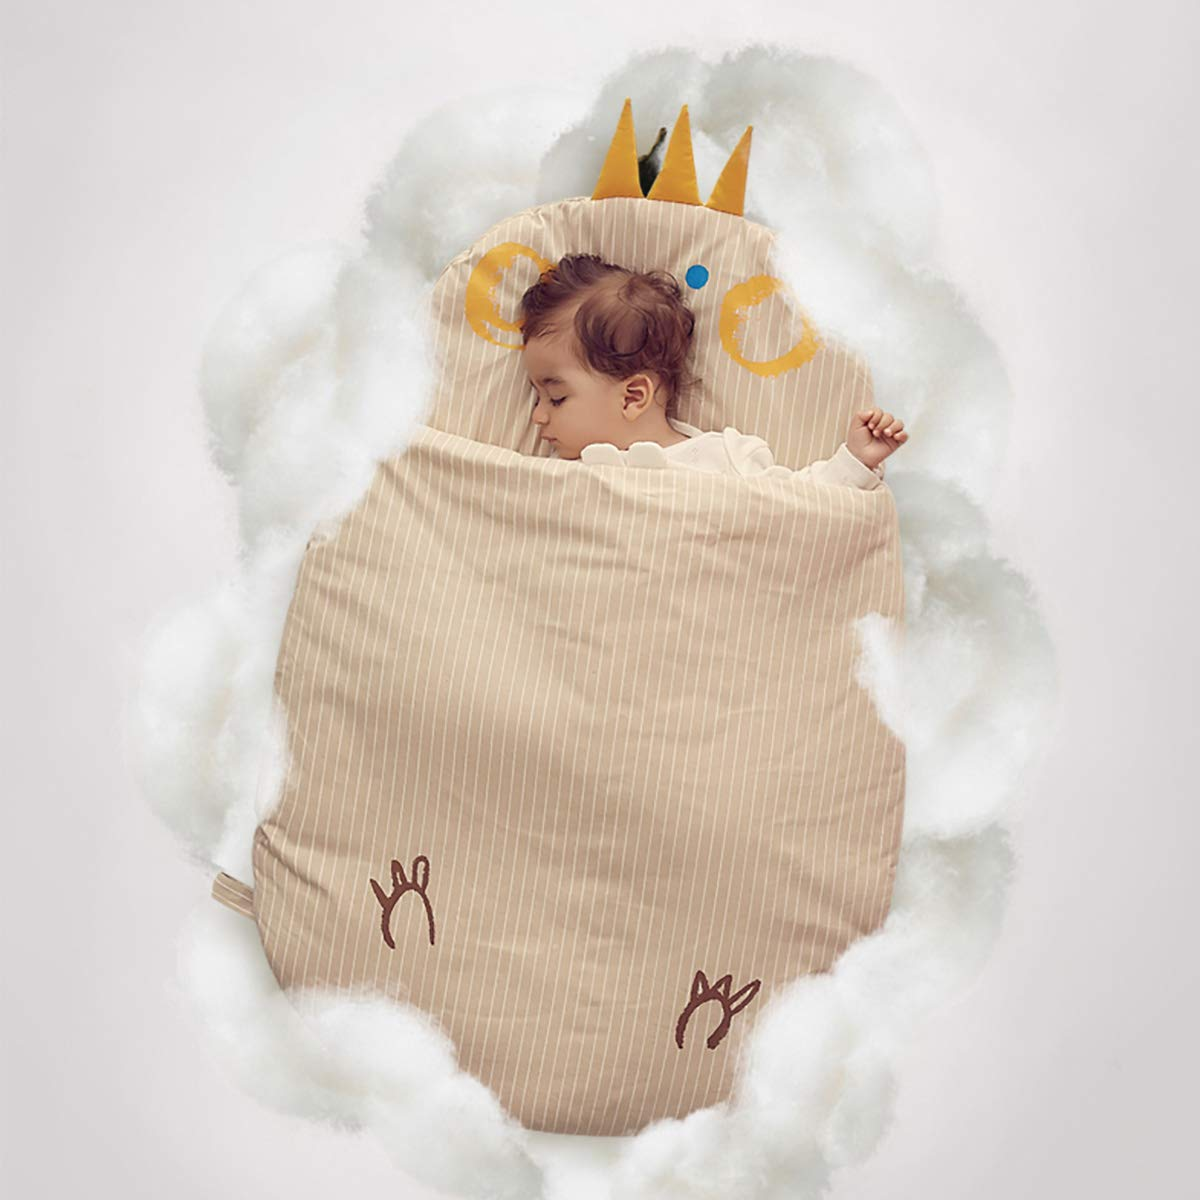 Bebamour Anti Kick Baby Sleeping Bag Safe Nights Cotton Baby Sleep Bag 2.5 Tog 0-18 Months and Above Cute Infant Boy Girls Sleeping Sack Baby Wrap Blanket Pink